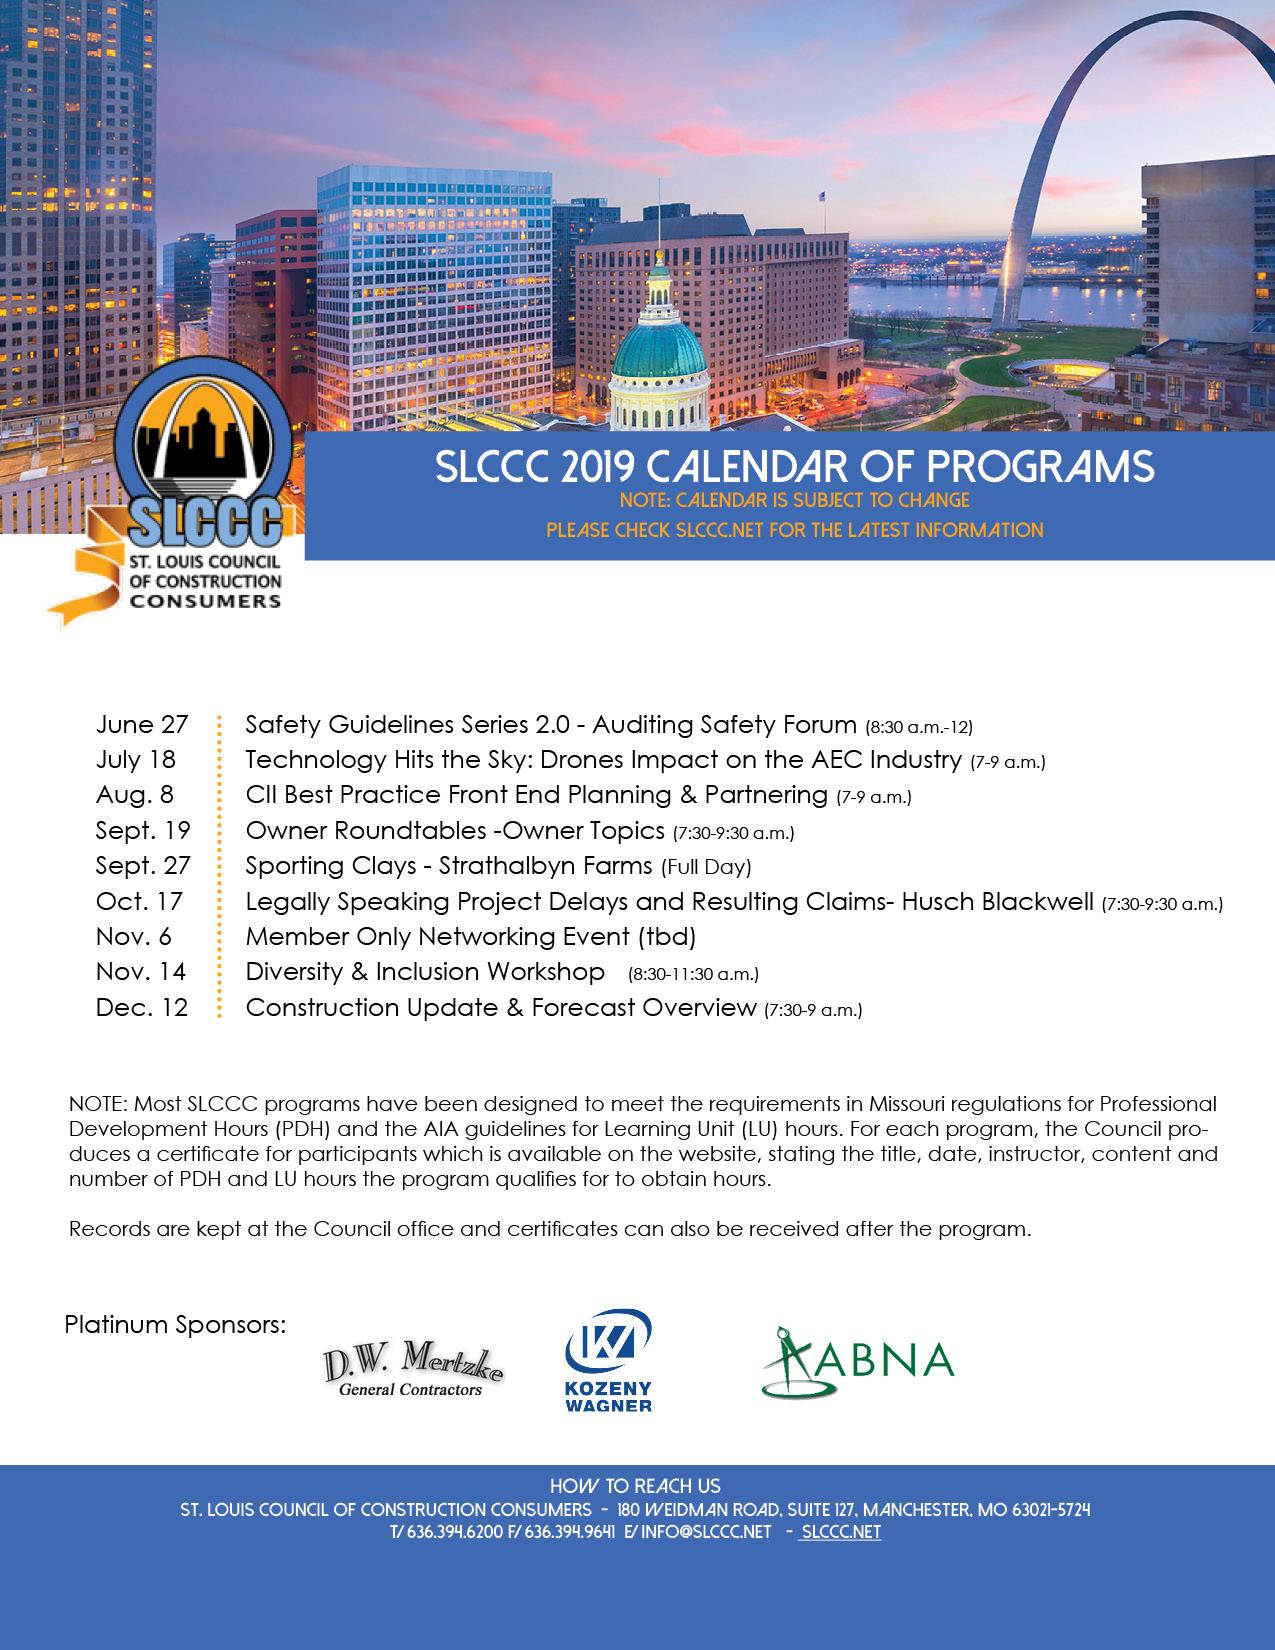 SLCCC Program Calendar